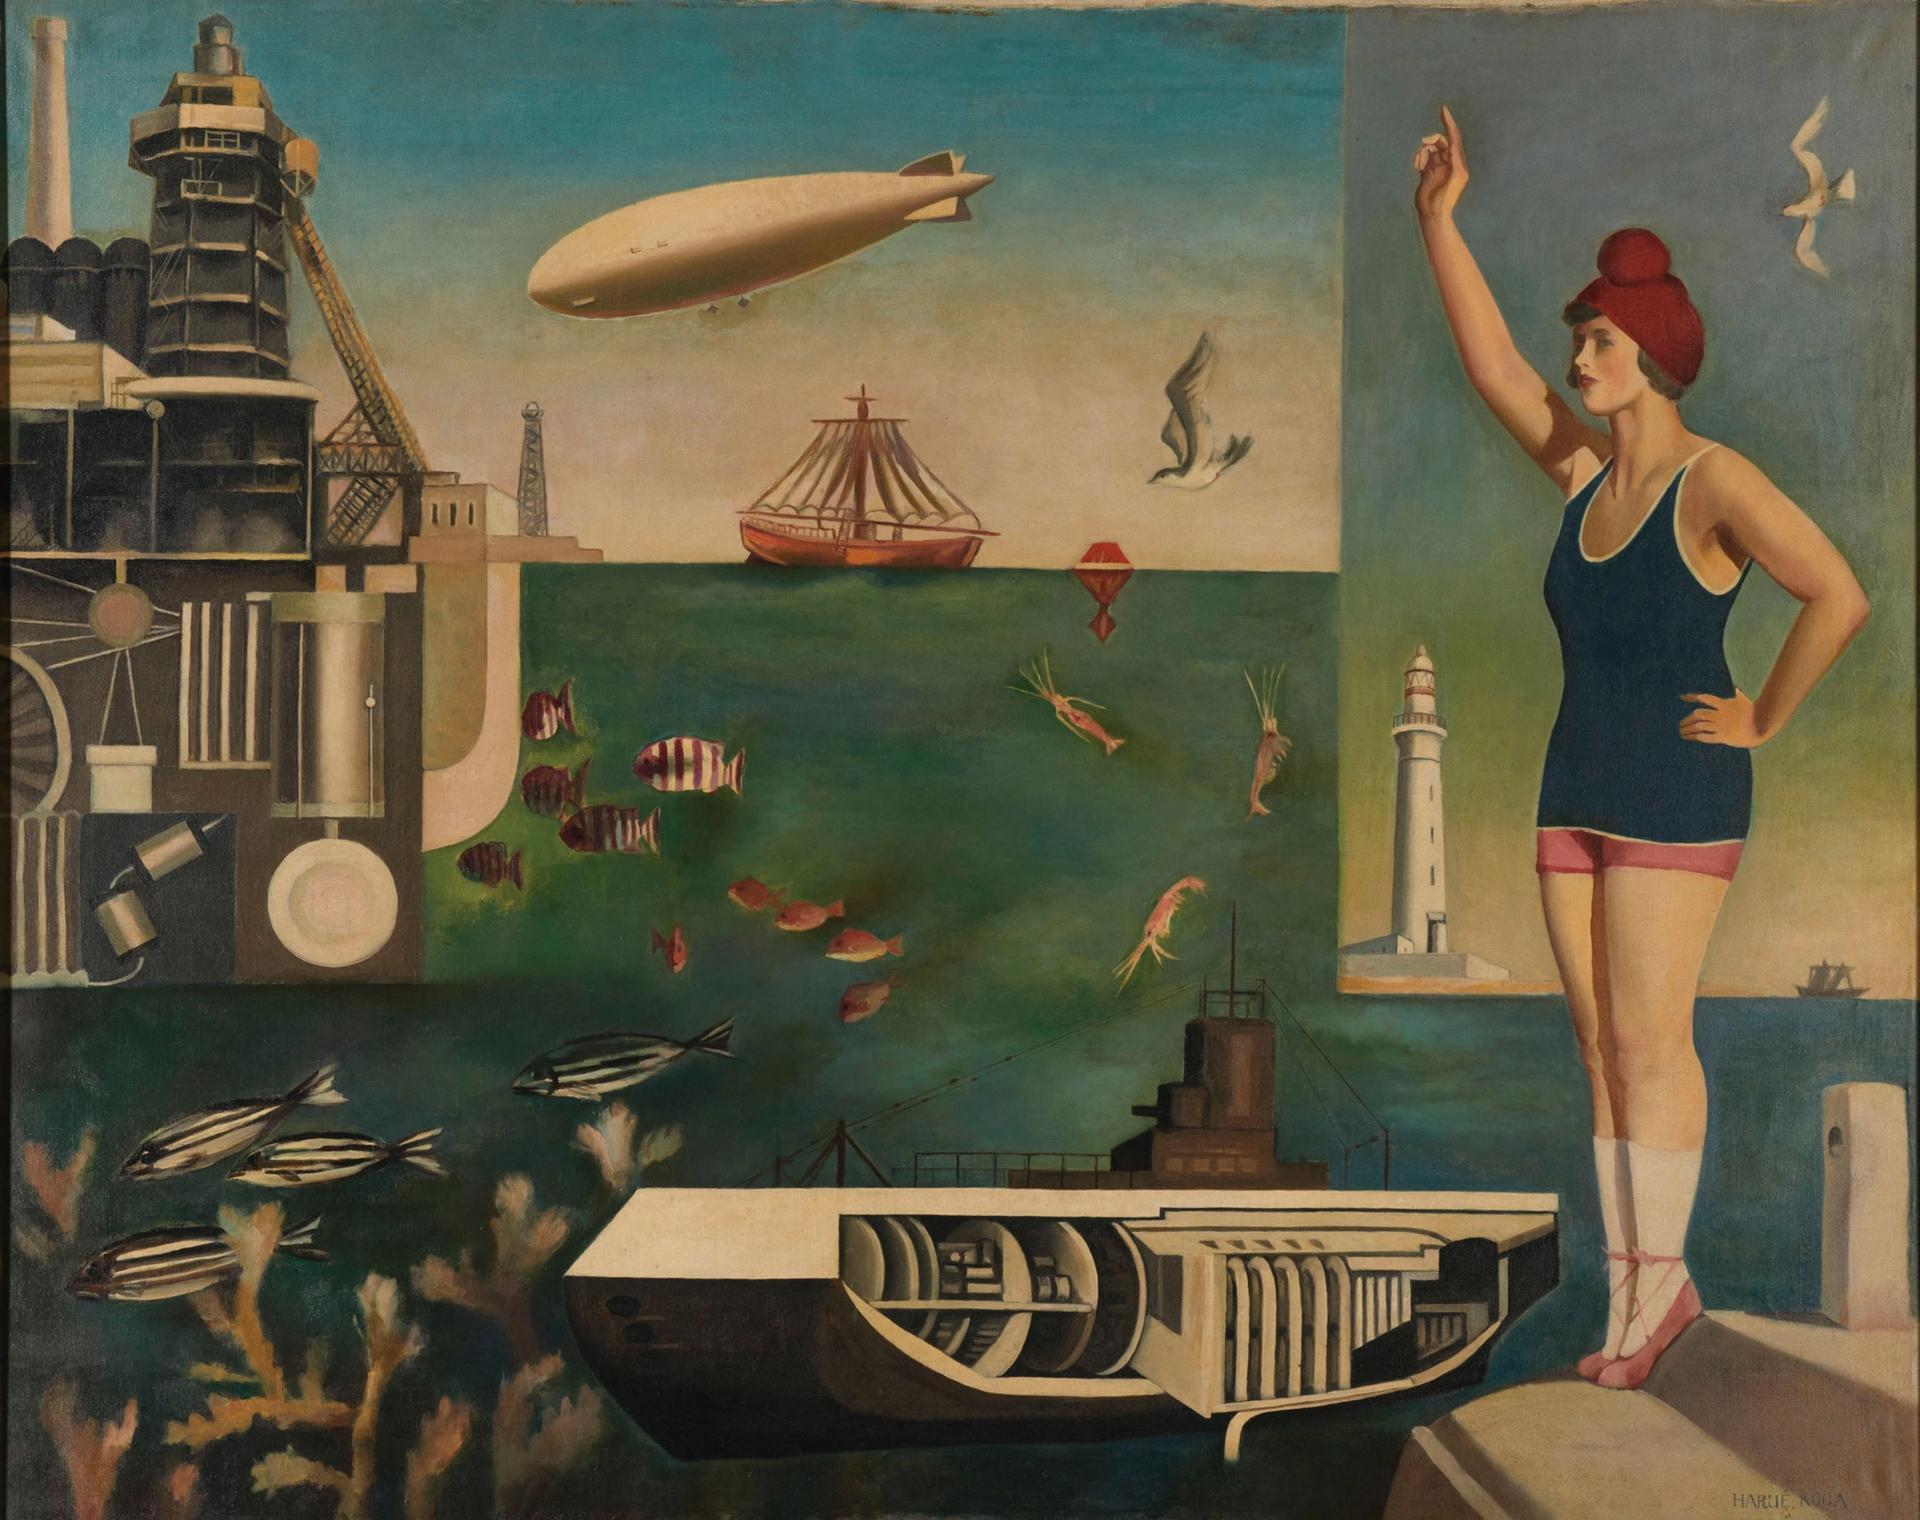 Koga Harue's Umi (The Sea) (1929) The National Museum of Modern Art, Tokyo